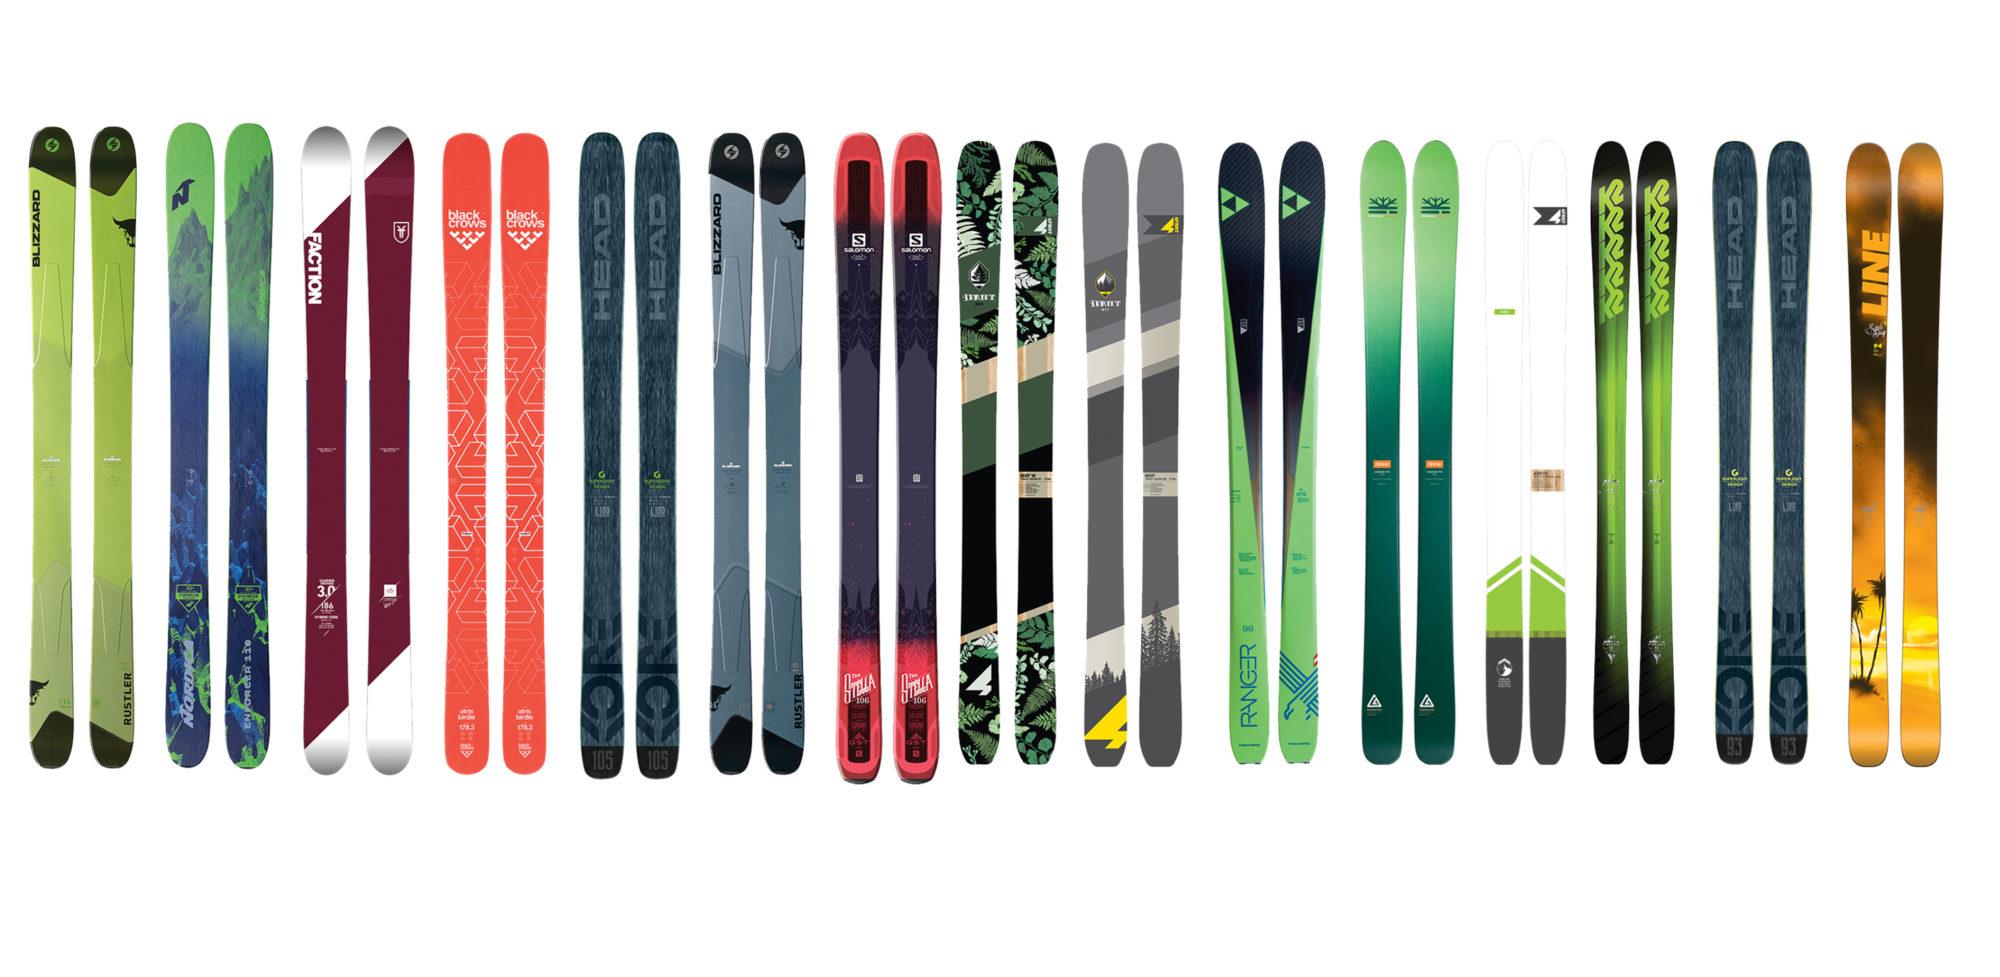 Femton par skidor i kategorierna Big Mountain och Allmountain. Foto  De  femton par skidorna i kategorierna Big Mountain och Allmountain. 2d52fb9e04